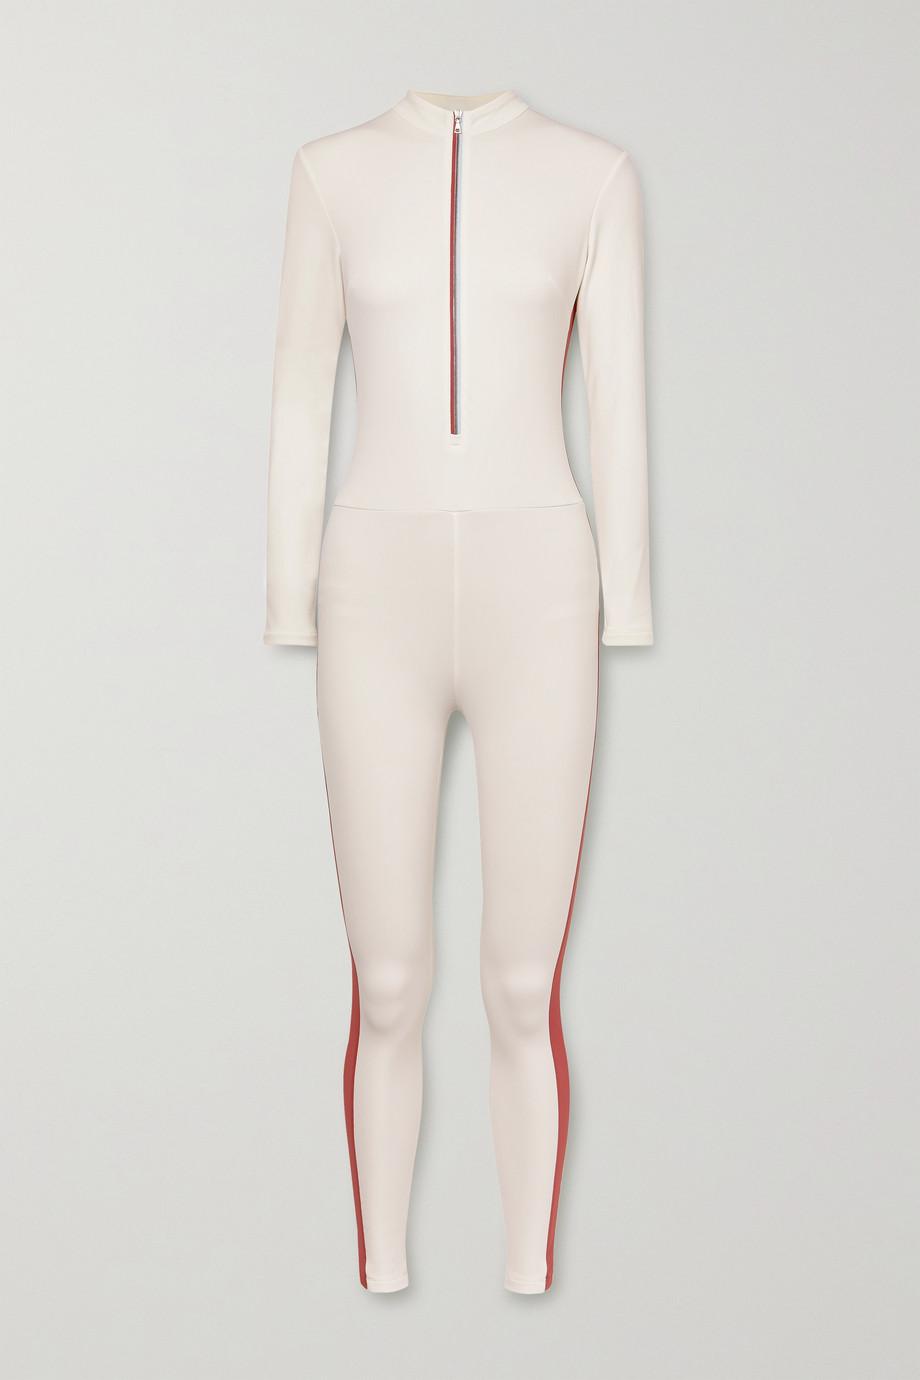 Vaara Selene Thermal striped stretch bodysuit